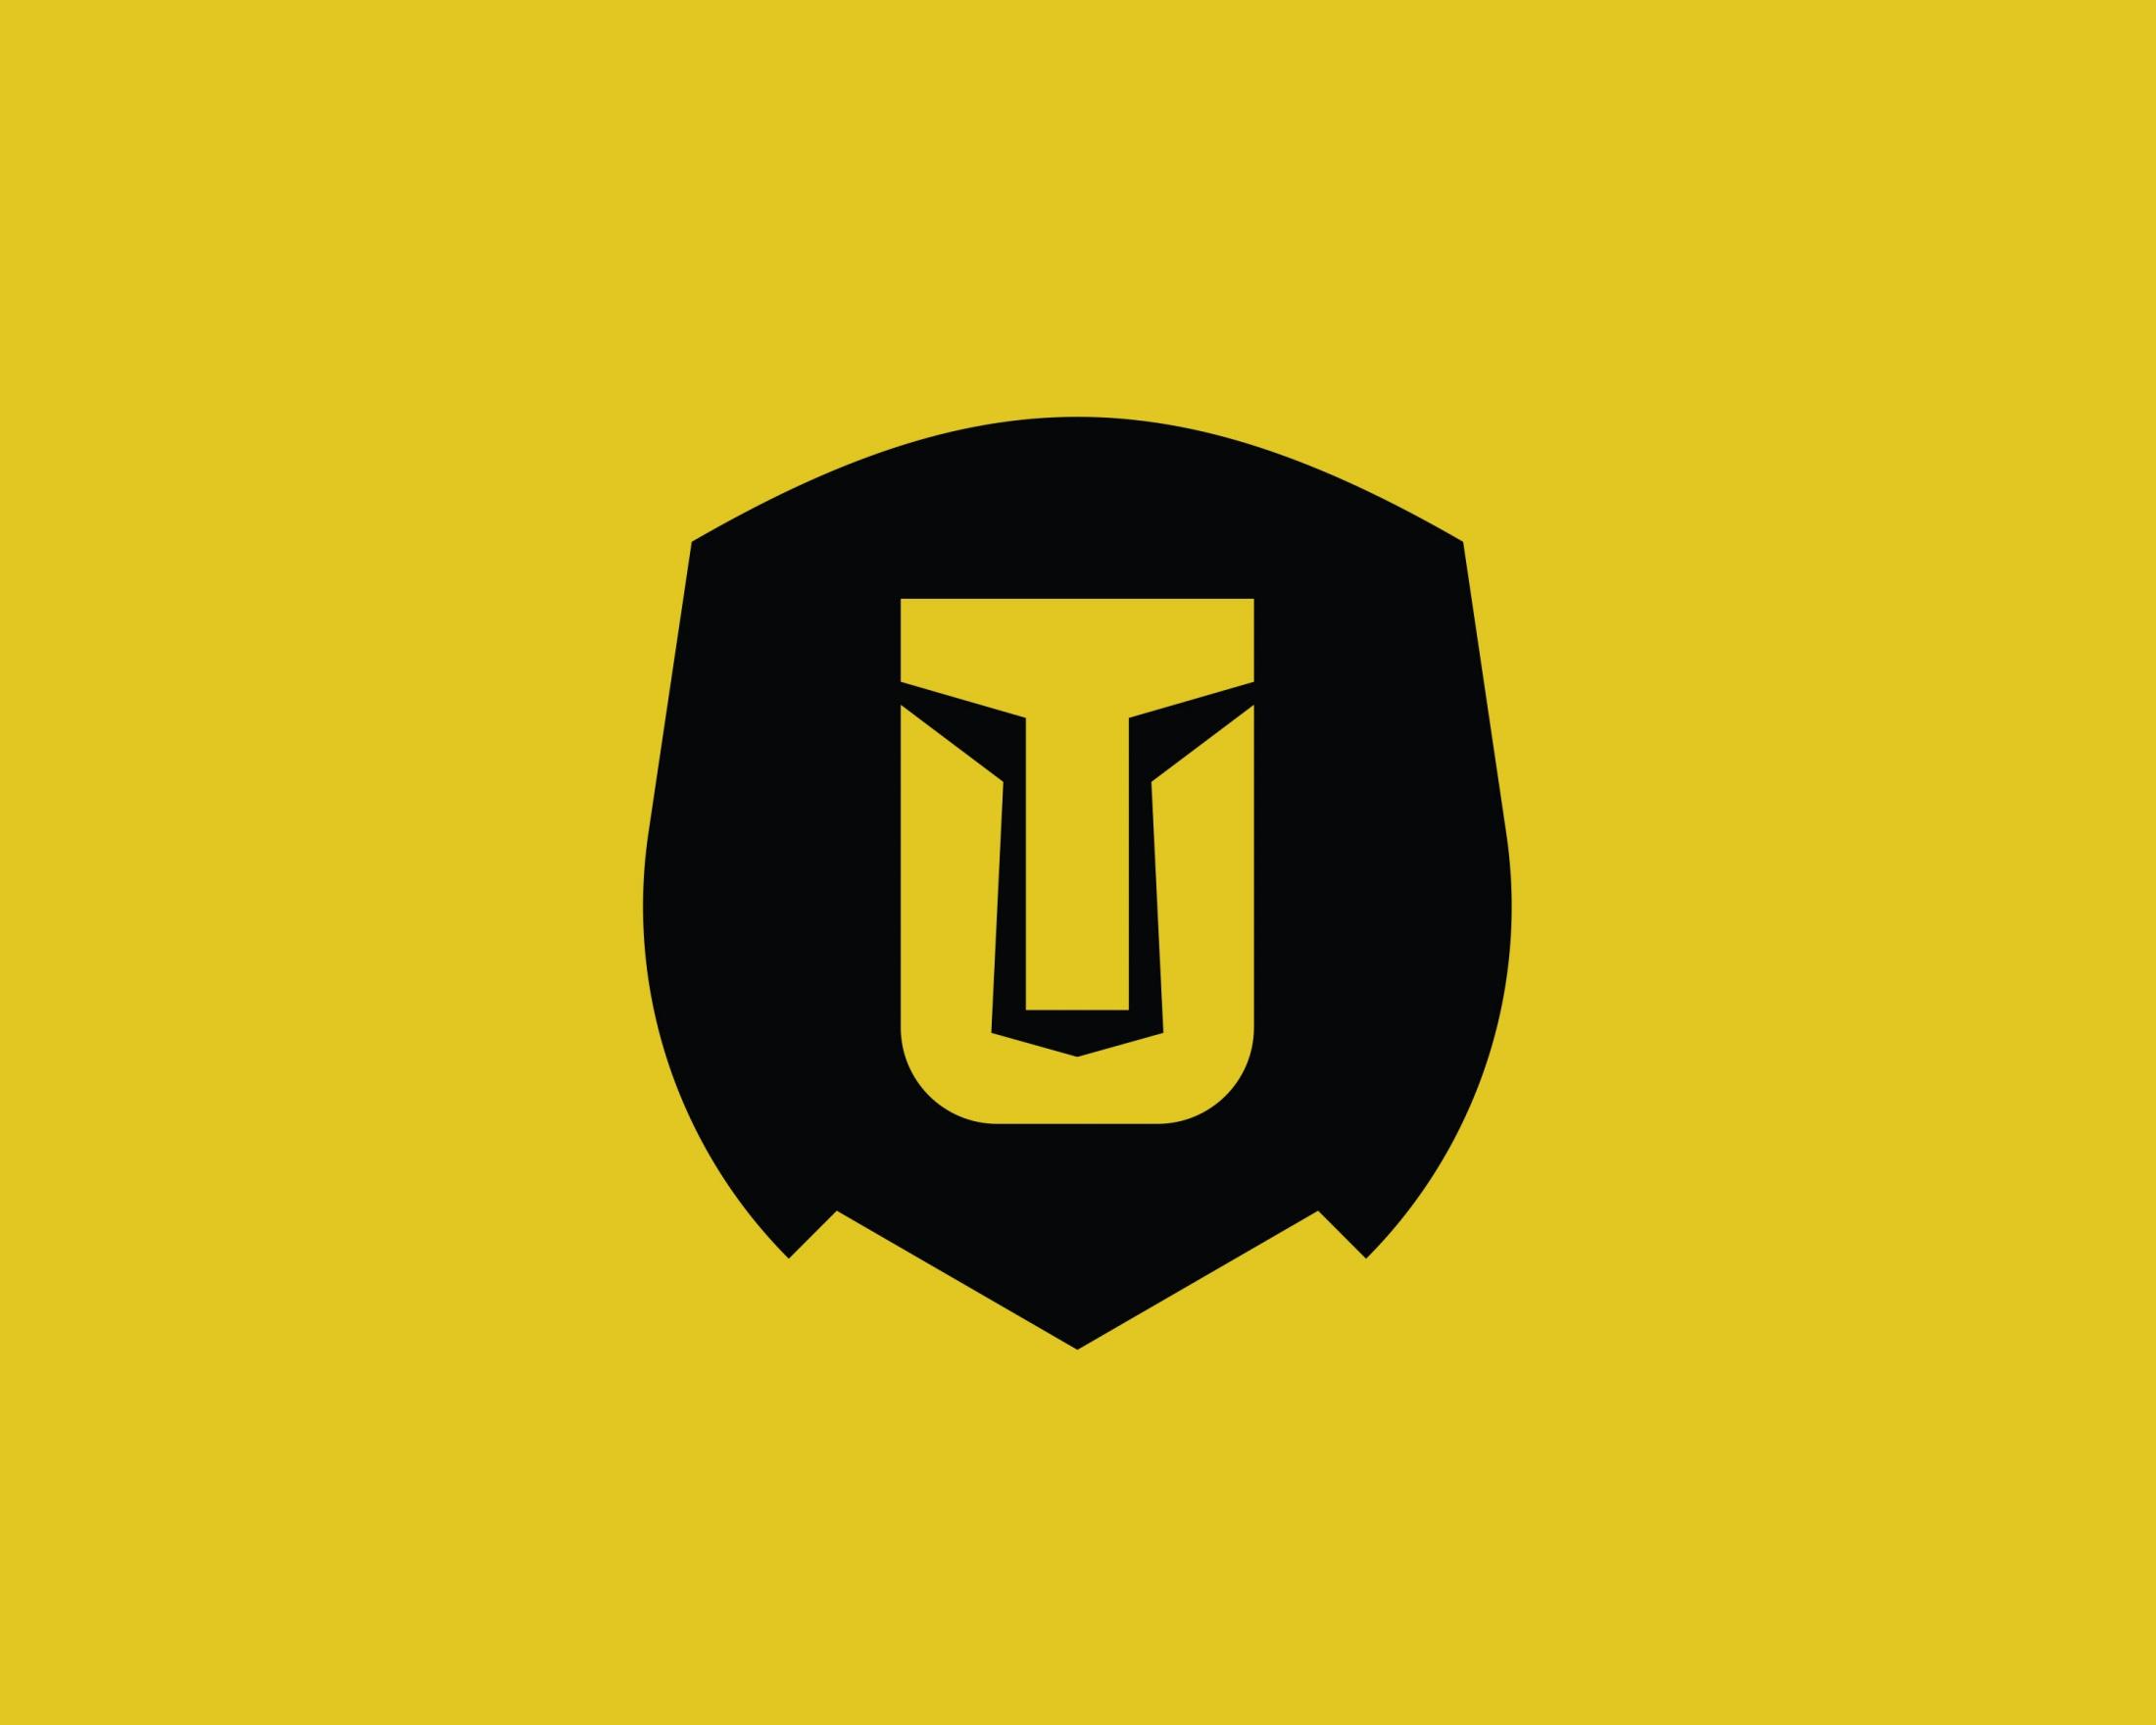 Thumbnail for Tyler Ulis Foundation Logo